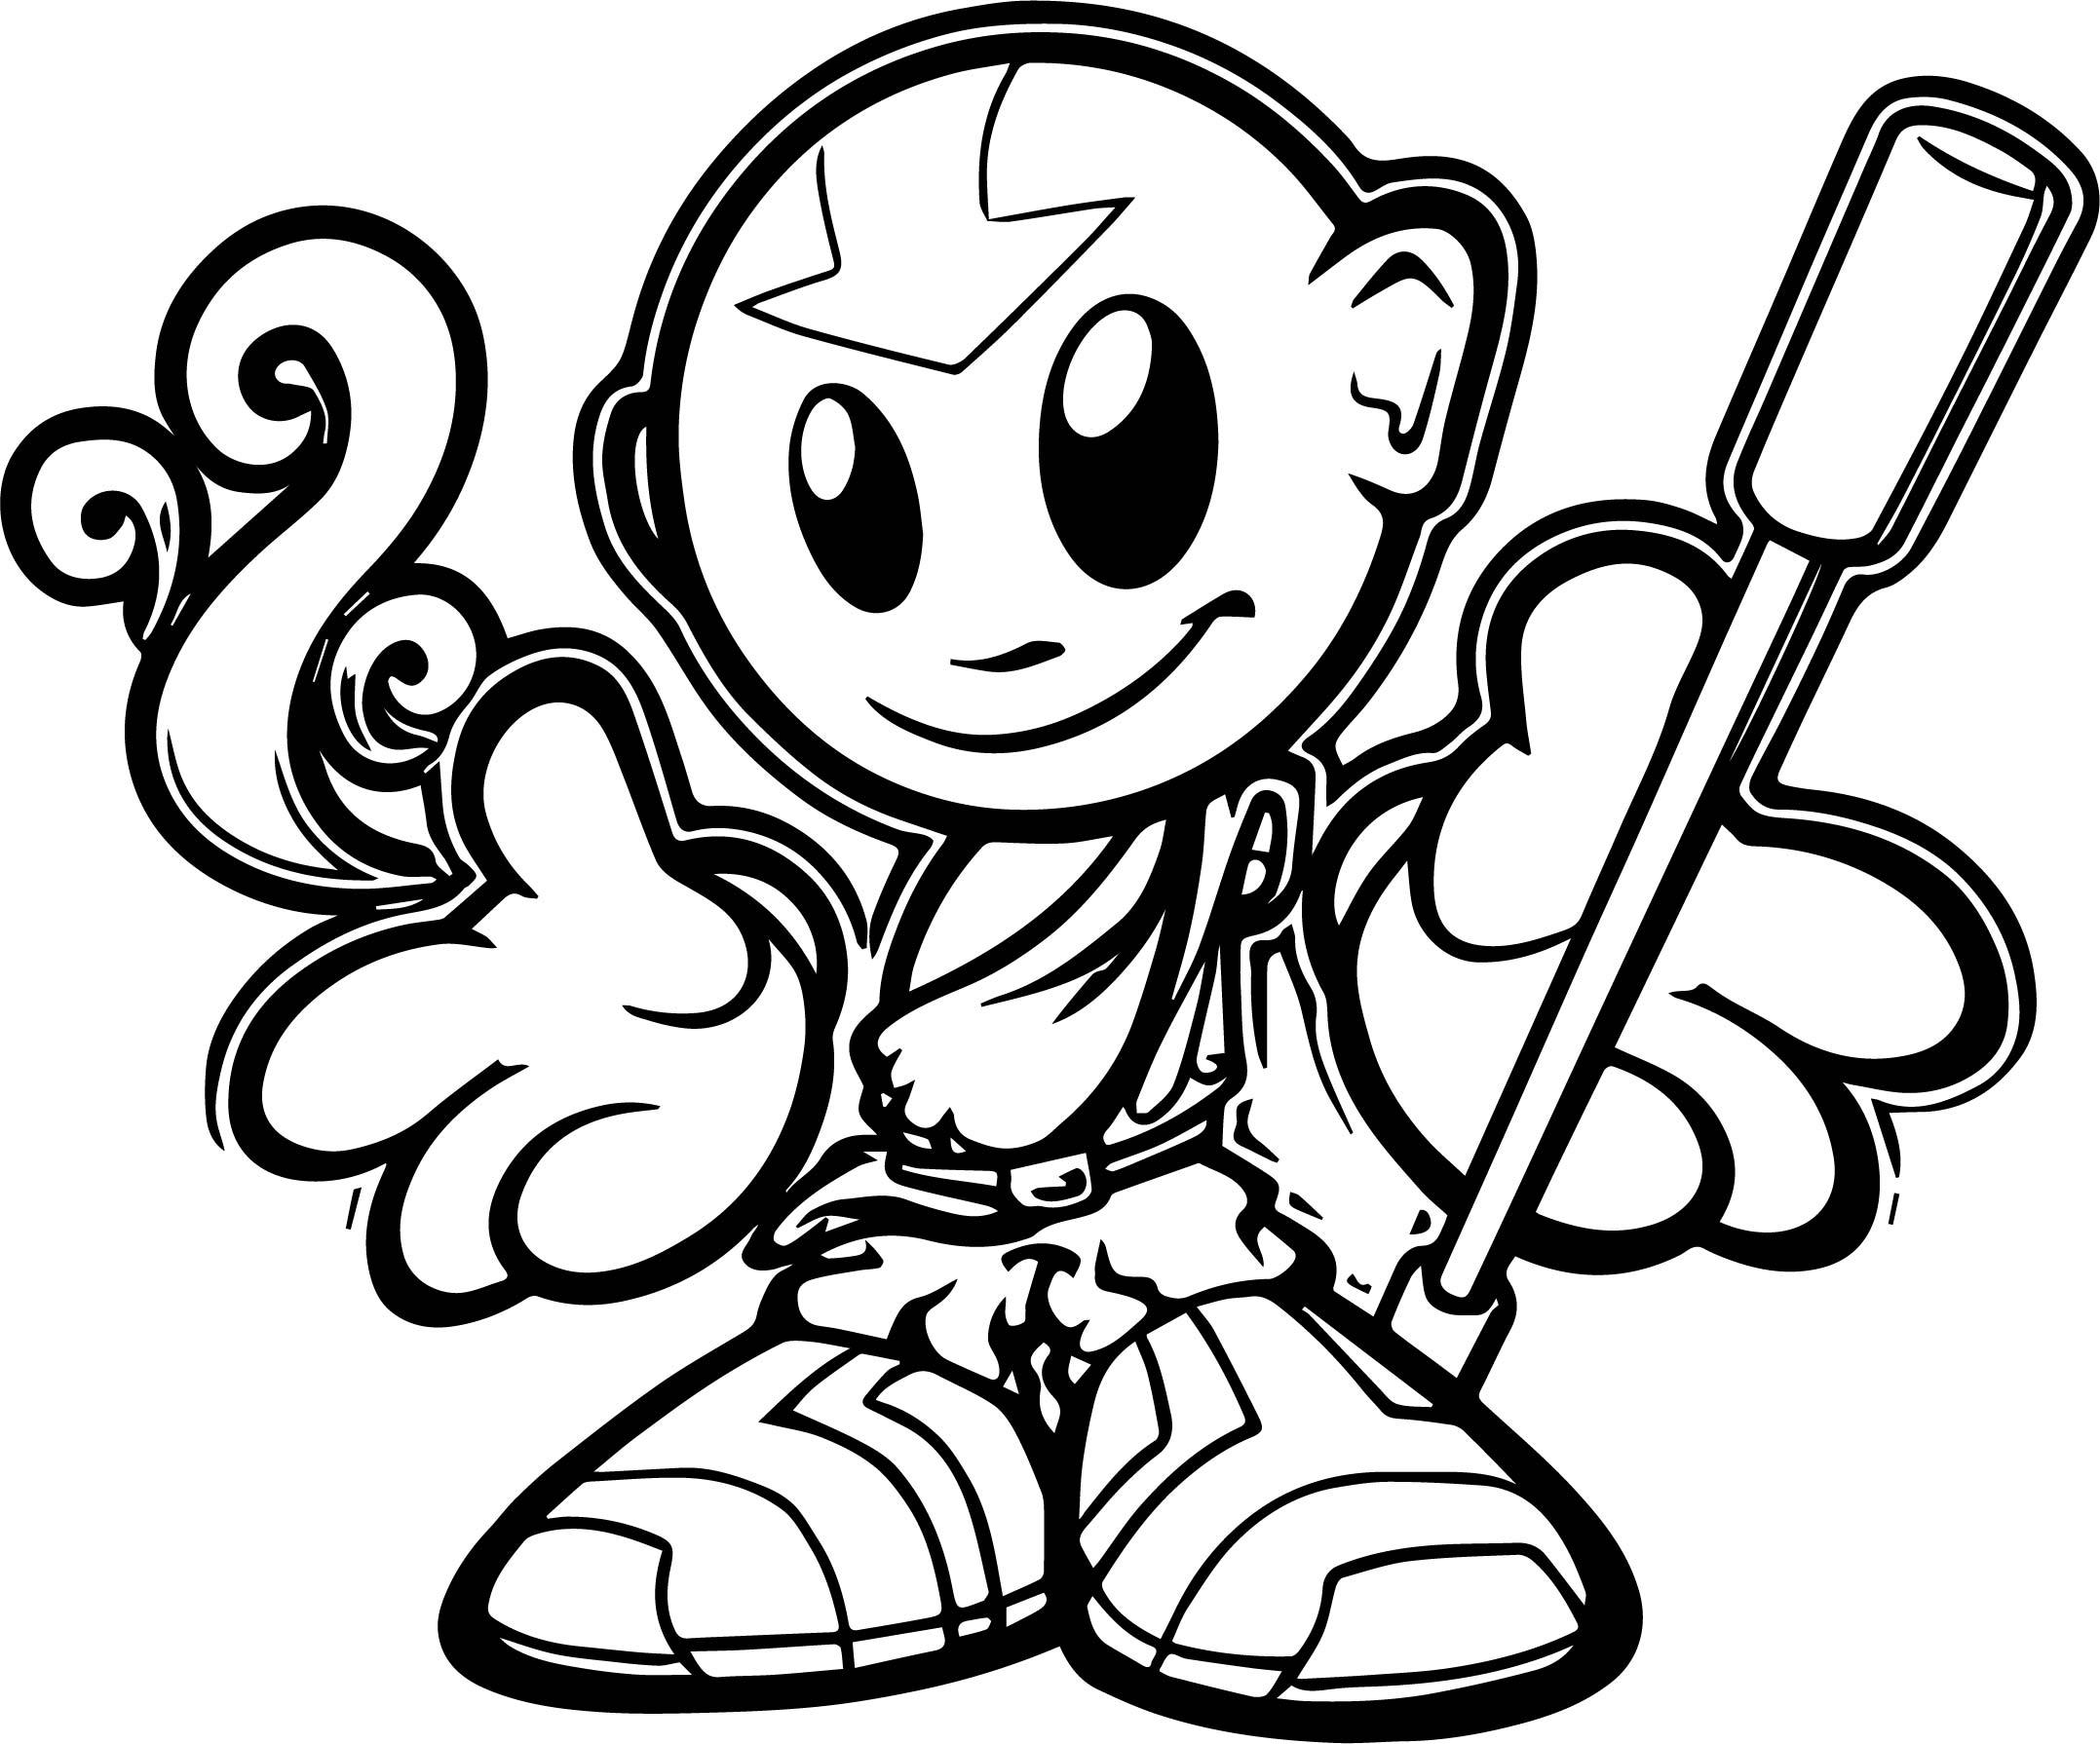 Doodle Avatar Aang Fella Avatar Aang Coloring Page